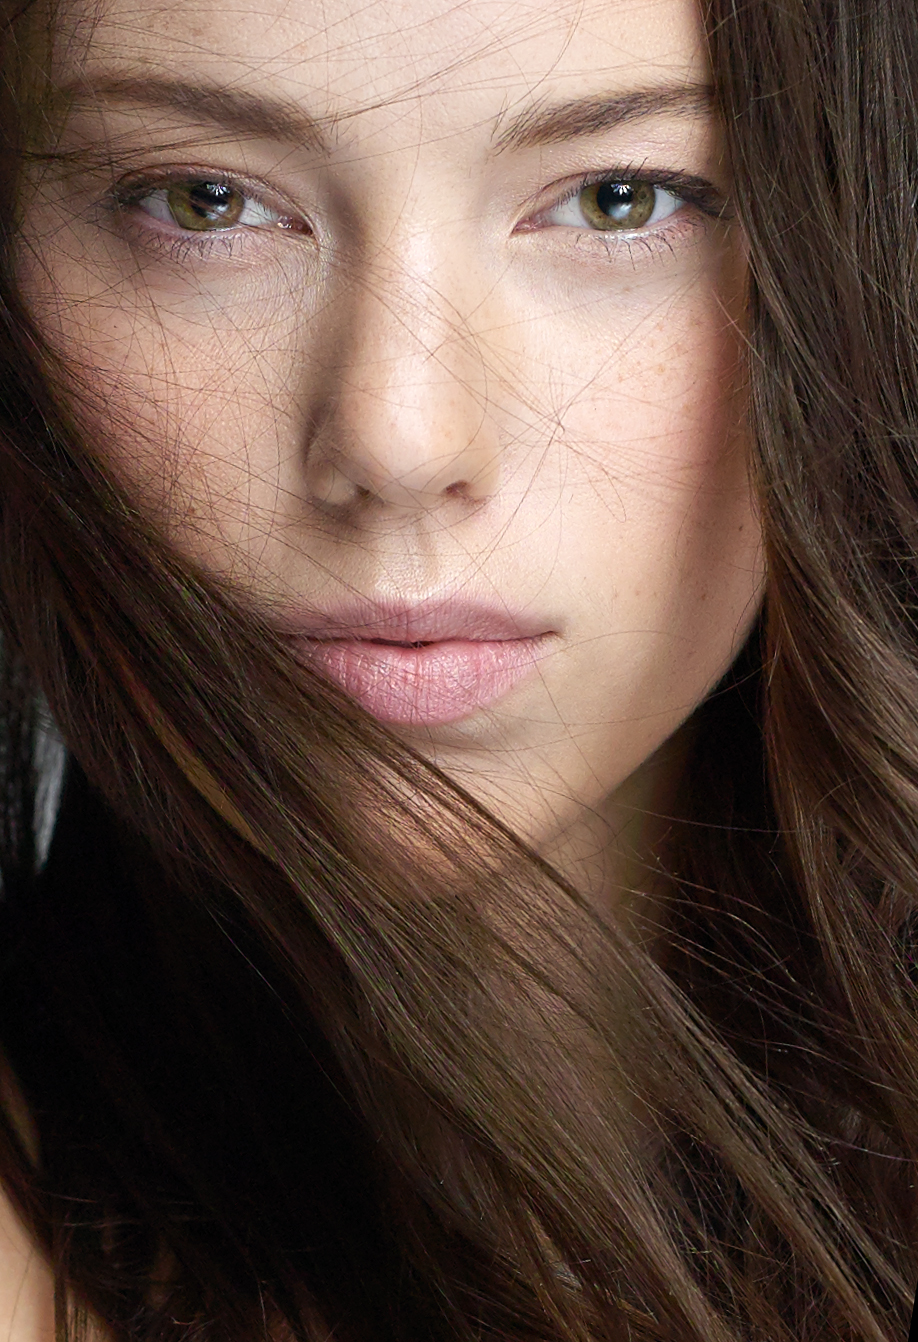 Cate Chant makeup by agne skaringa hoolywood makeup artist.jpg